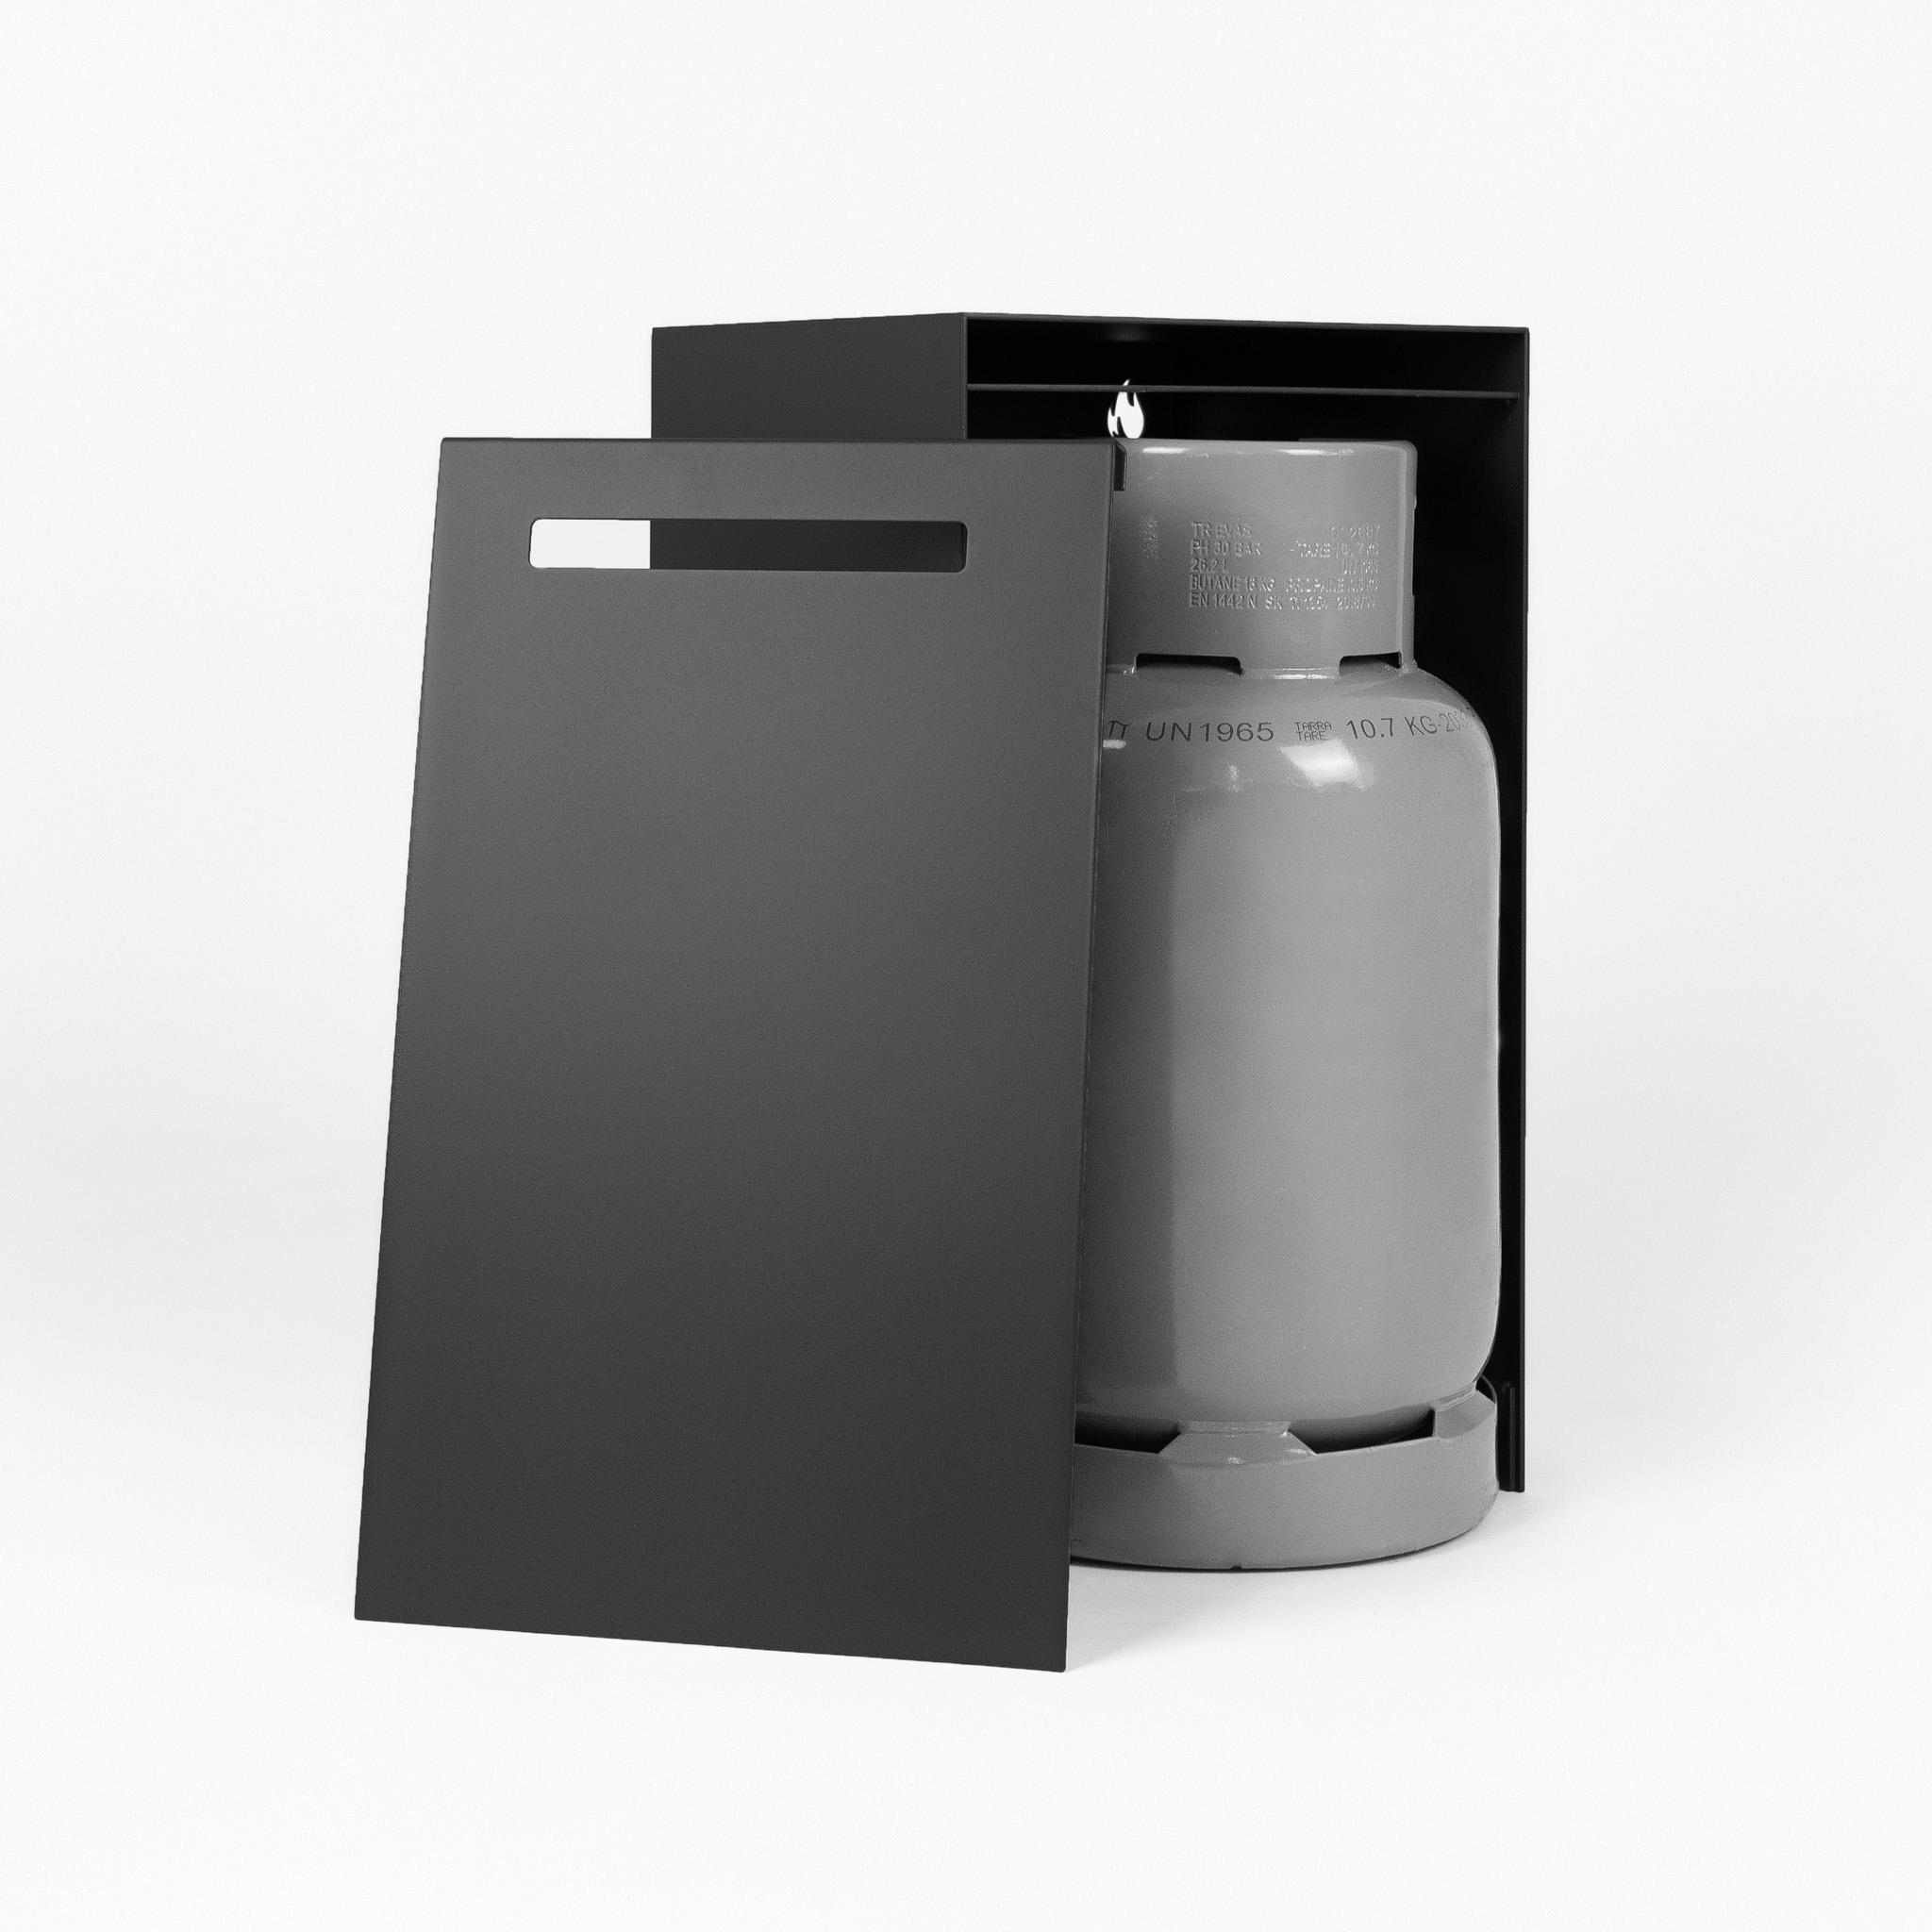 2020-2048sqr-sunwood-gasbox-jet-black-6